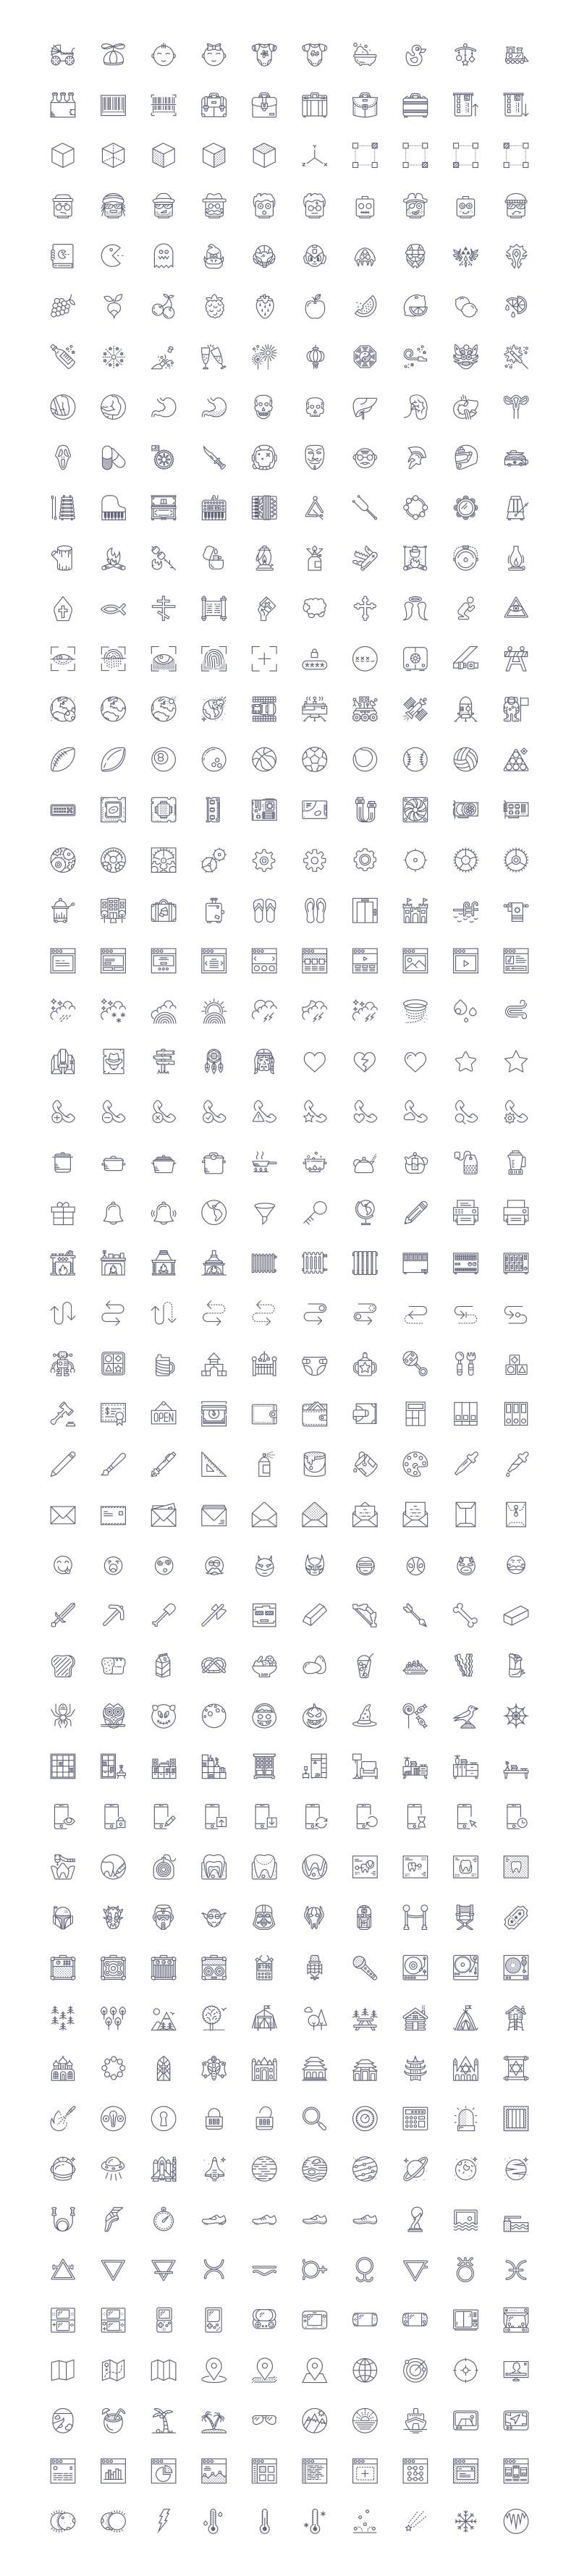 Smashicons: 300 Free Icons 1